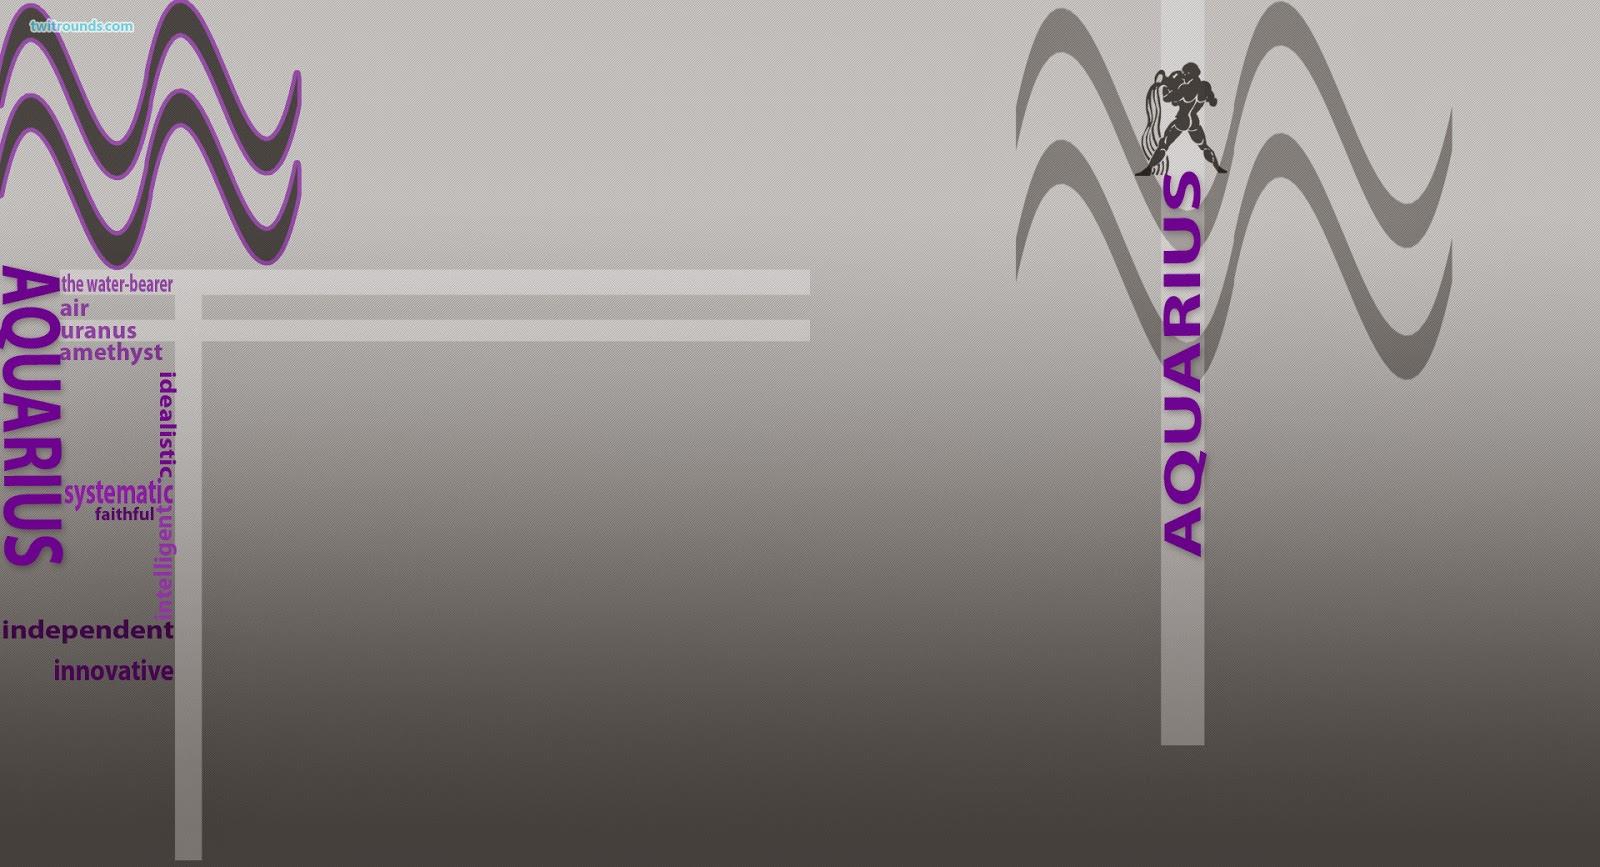 Aquarius zodiac sign, gray background